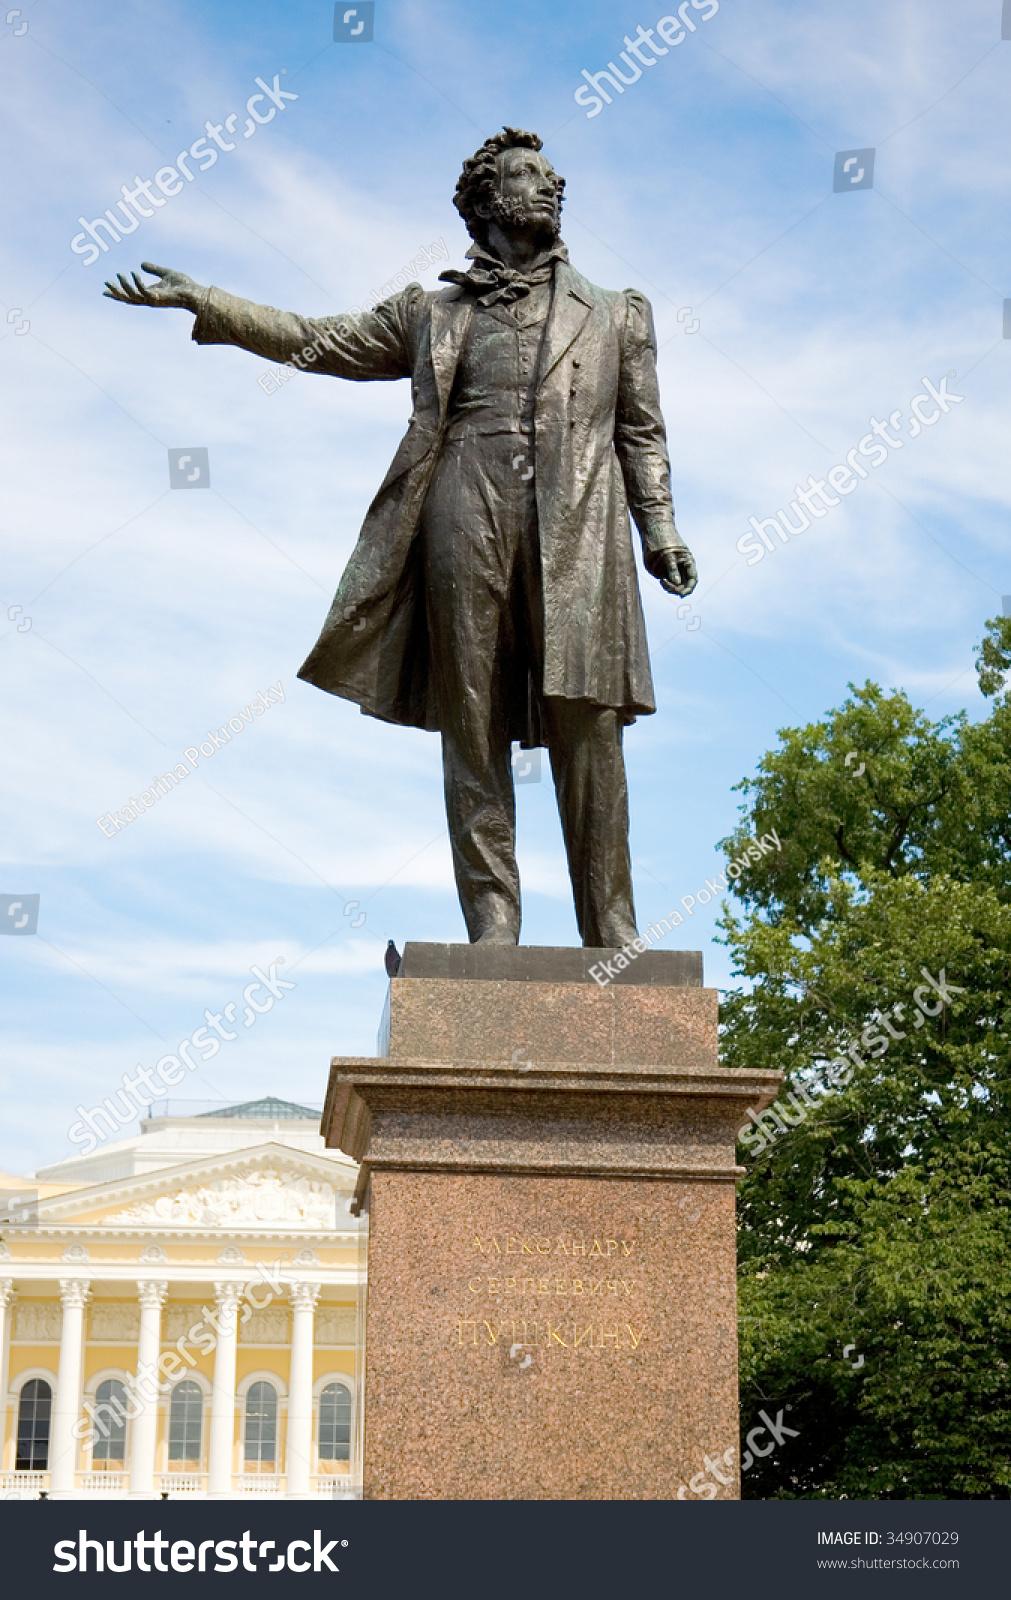 Statue of Alexander Pushkin, famous Russian poet. Arts Square, St.Petersburg, Russia        - Image